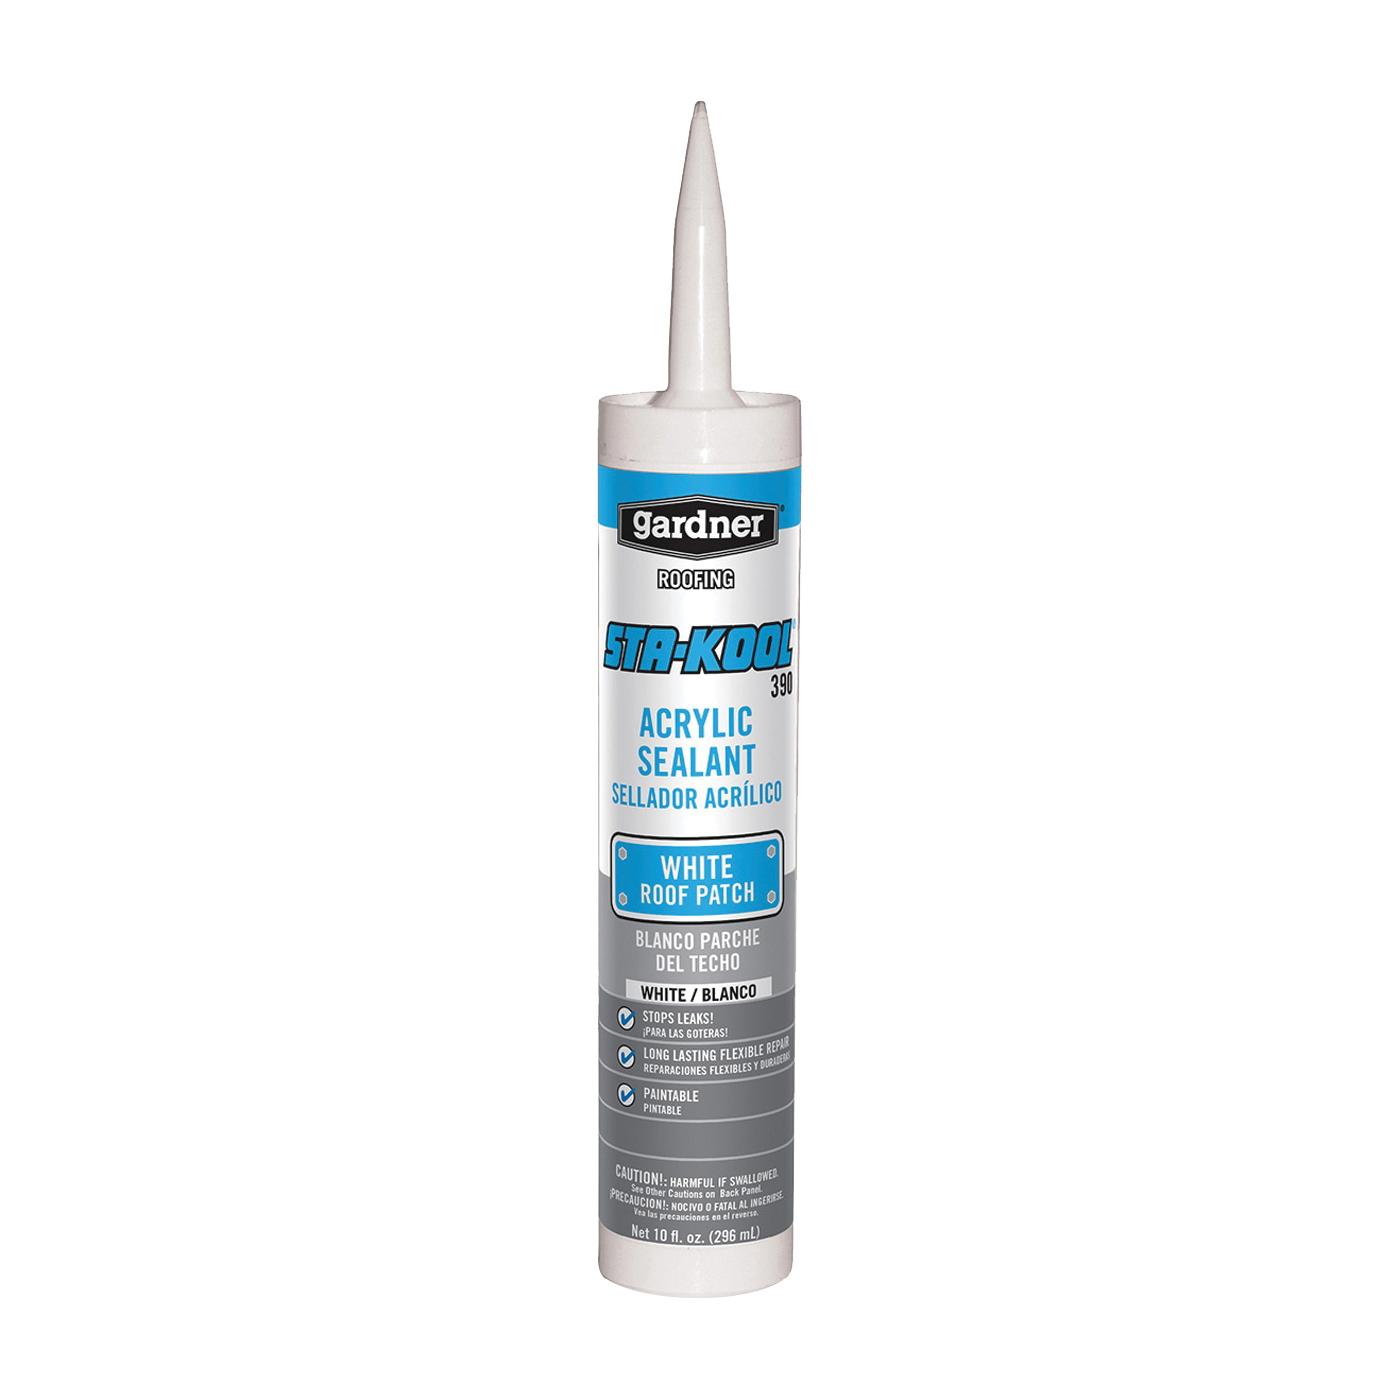 Picture of Gardner STA-KOOL 390 Series SK-3909 Acrylic Sealant, White, Liquid, 10 fl-oz Package